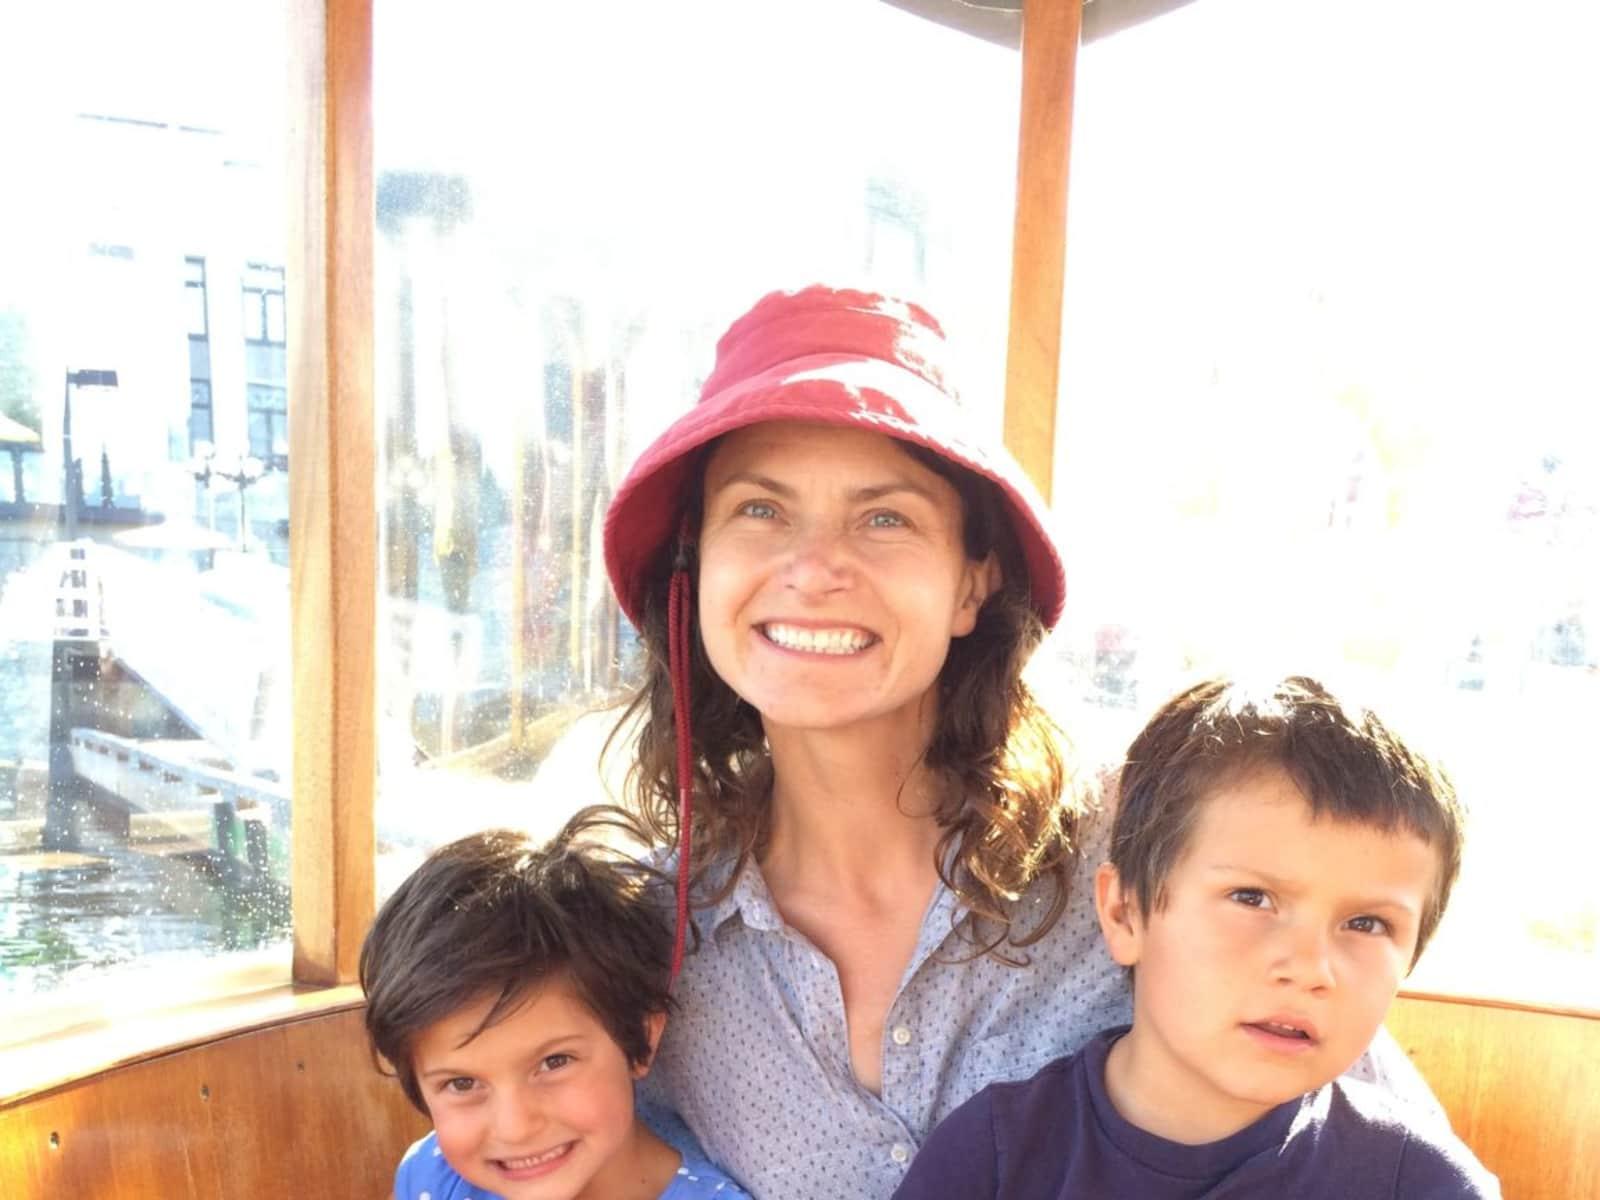 Amanda from San Francisco, California, United States